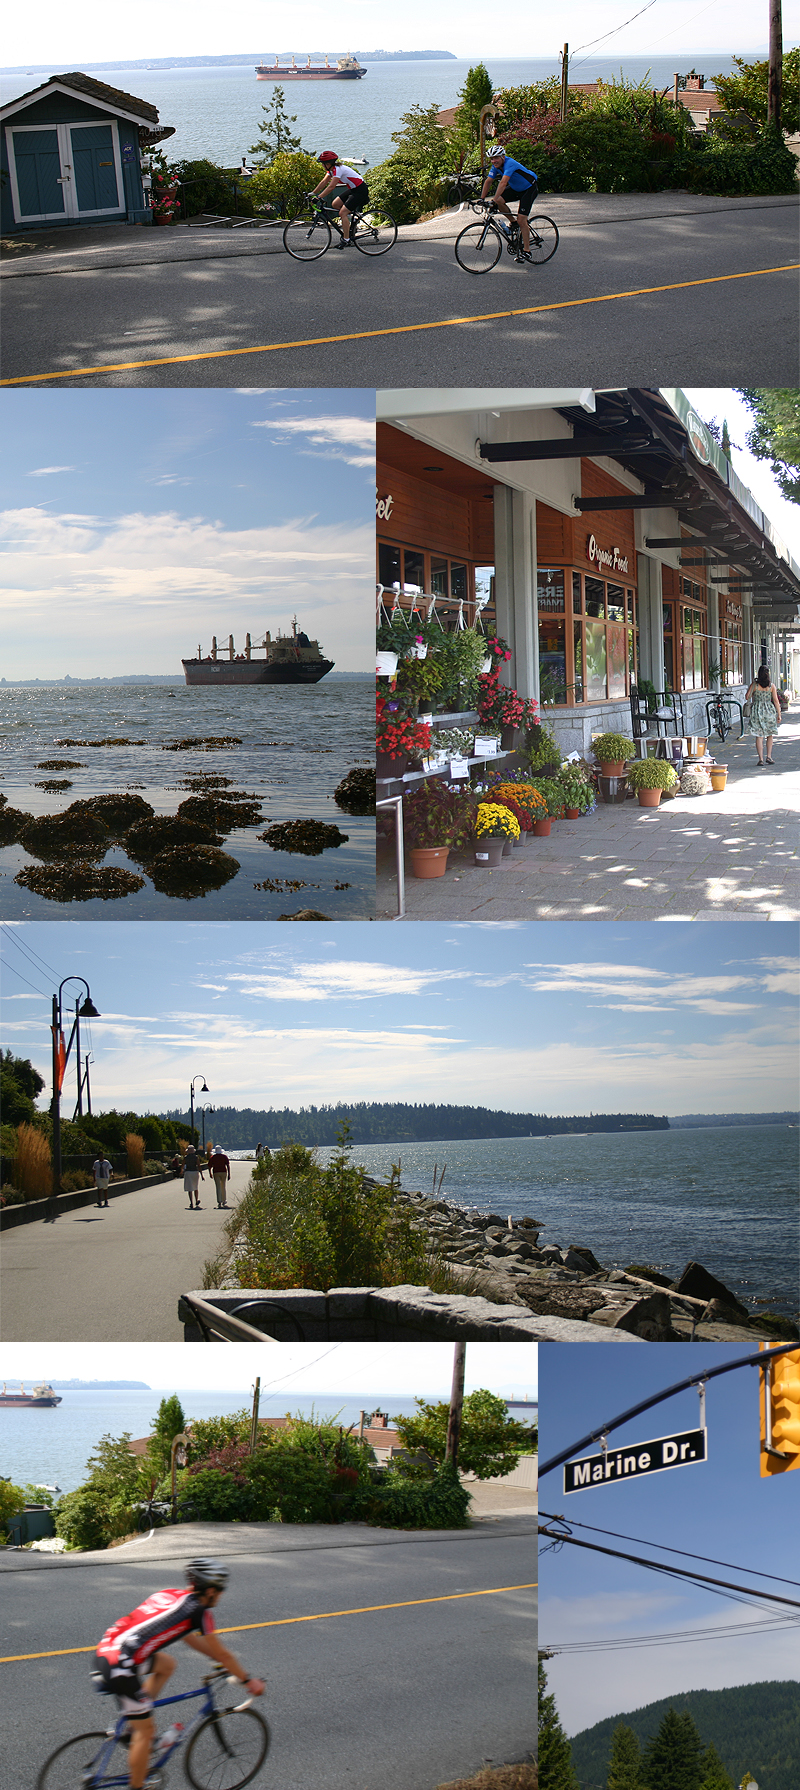 Marine Drive, Vancouver, British Columbia